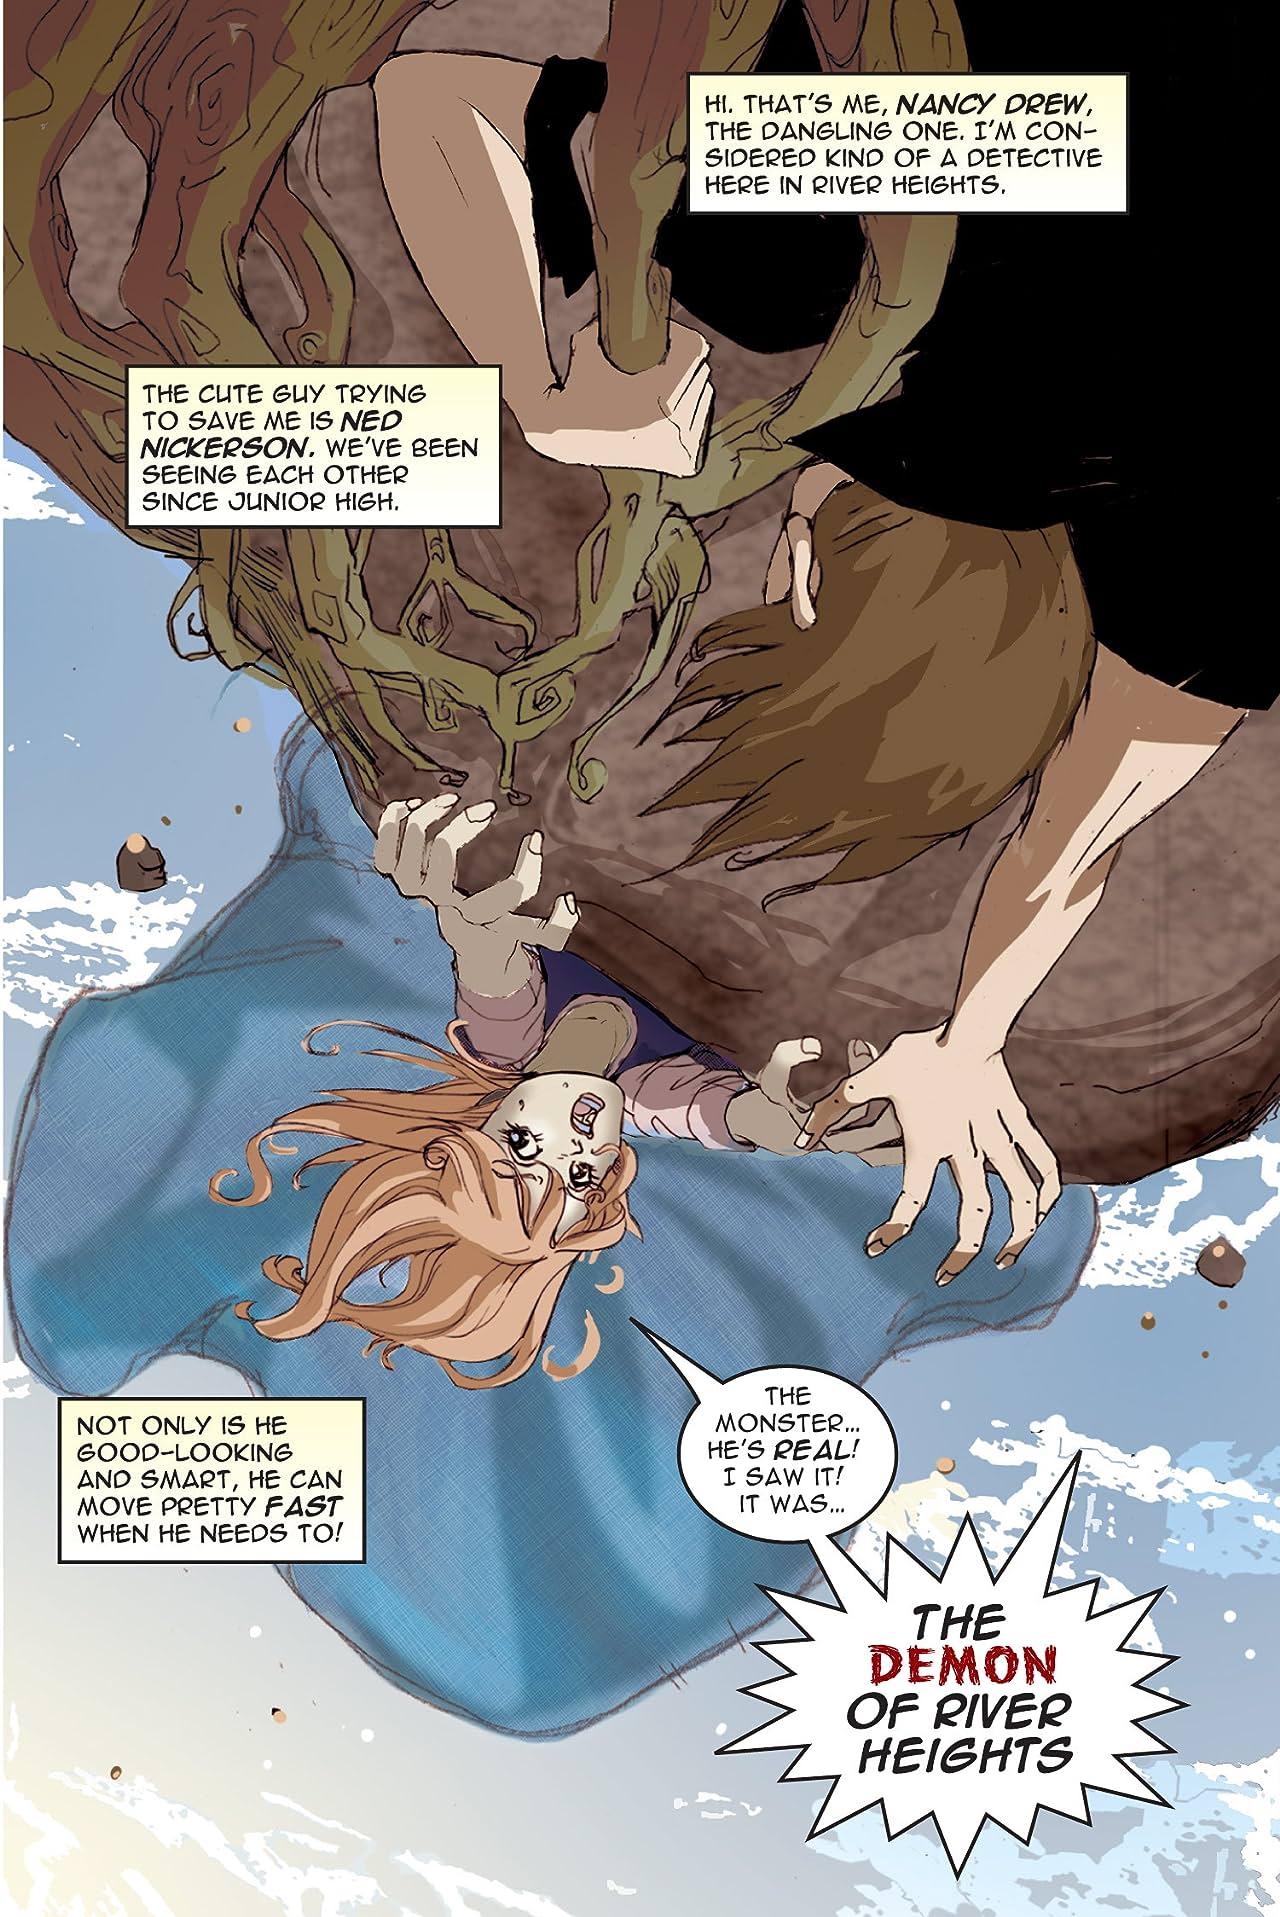 Nancy Drew Vol. 1: The Demon of River Heights